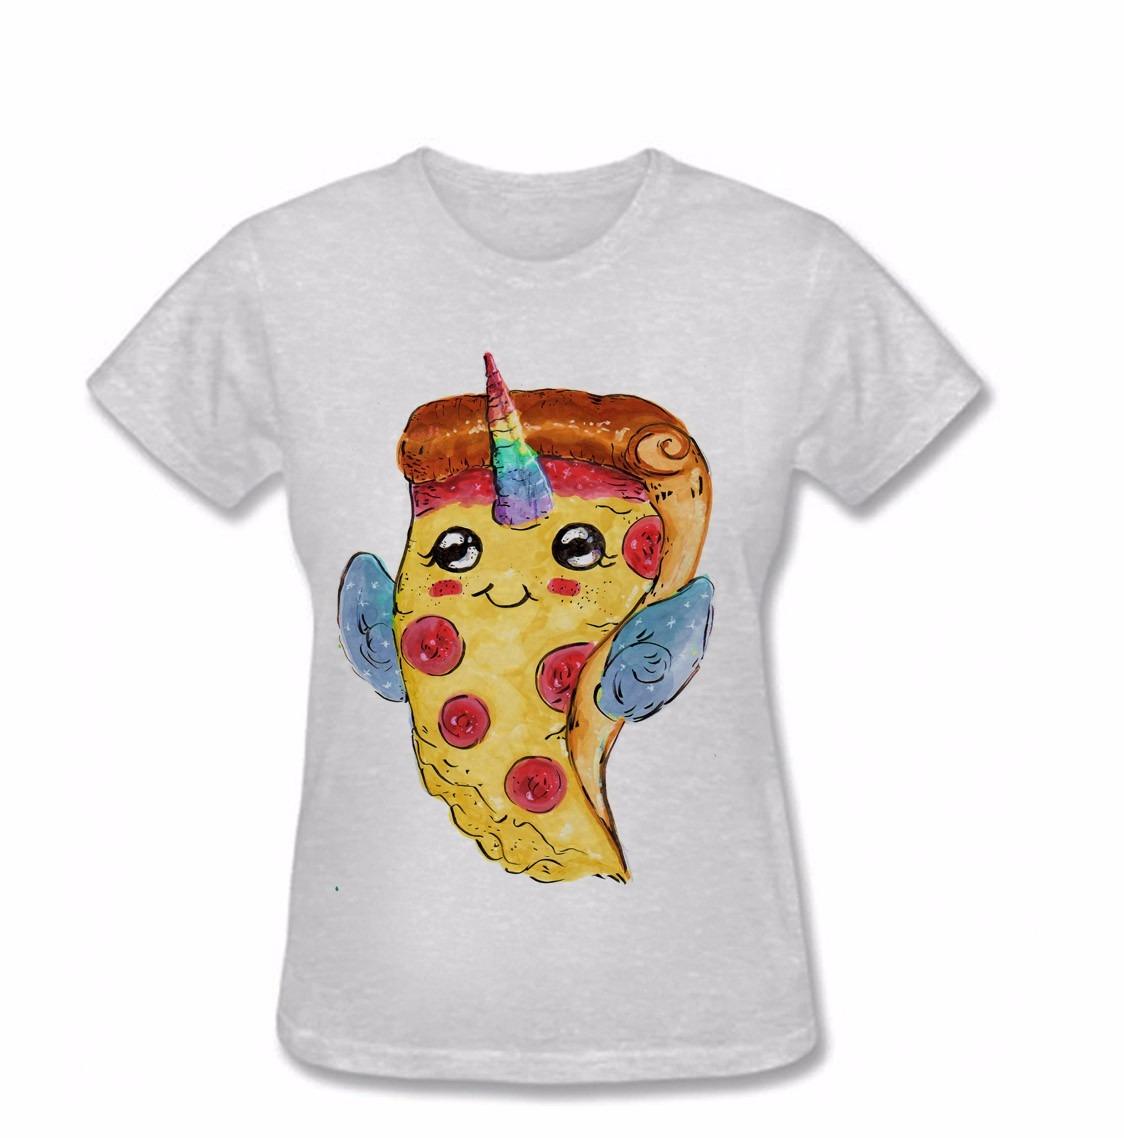 Camiseta Juvenil Feminina Pizza Unicornio Kawaii Fofa Tumblr R 25